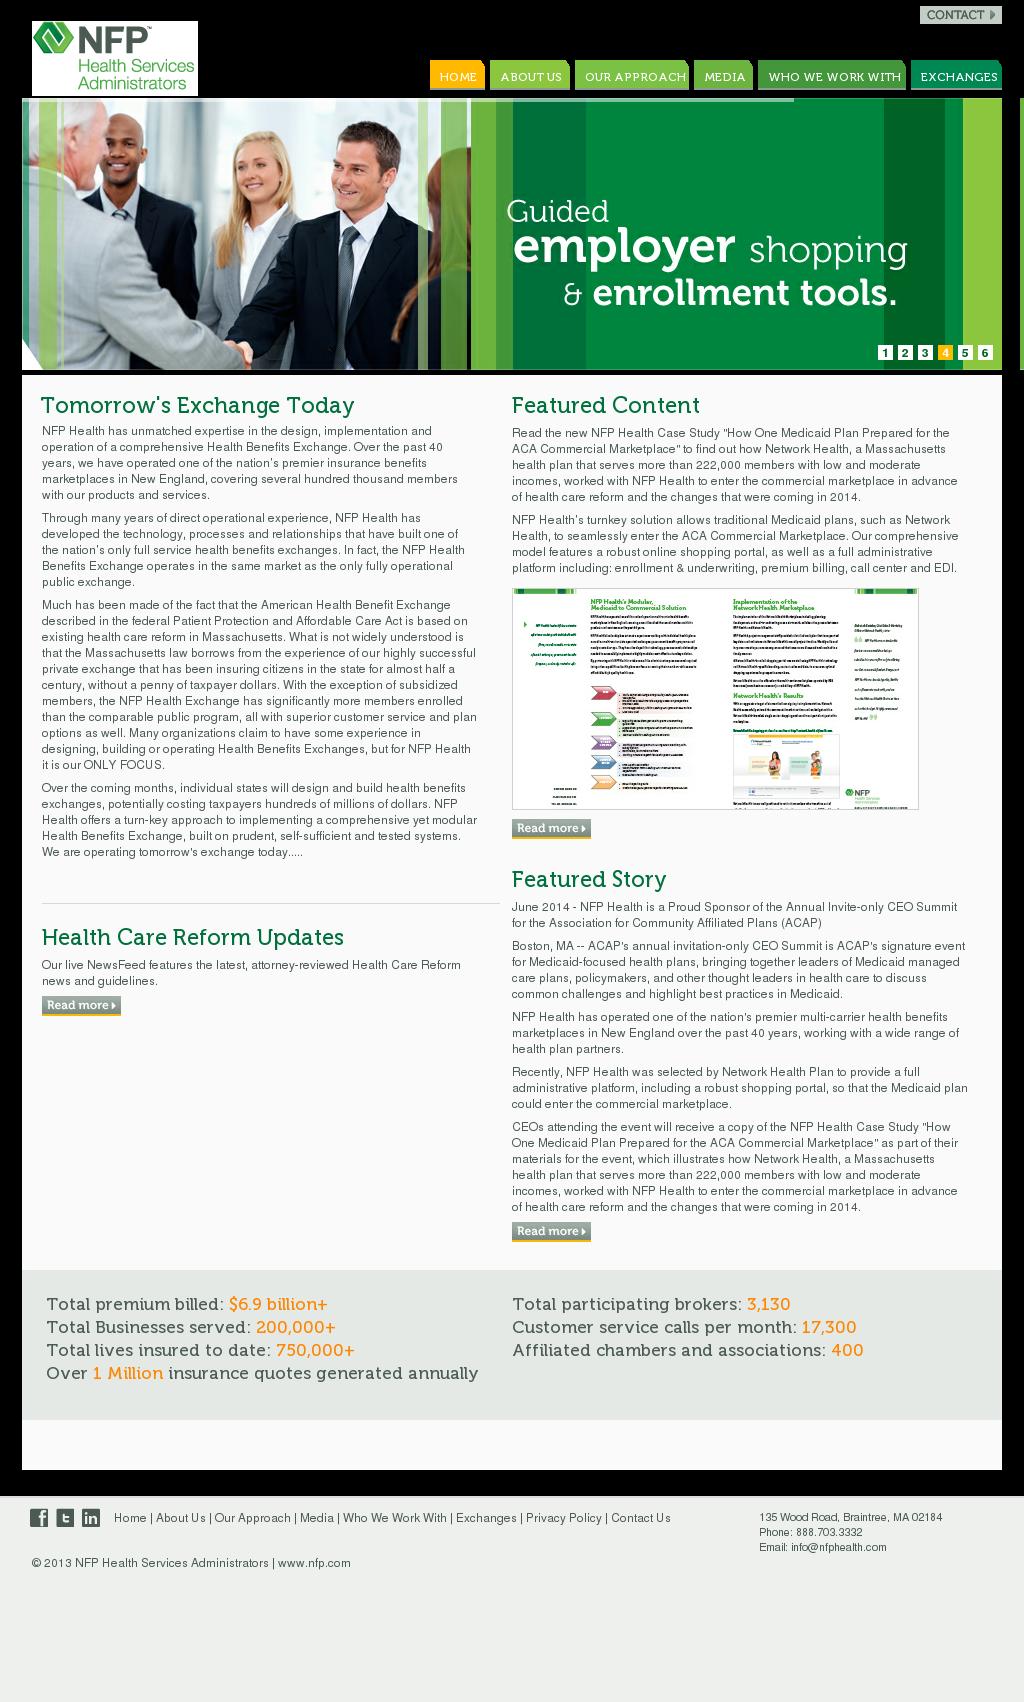 Health Information Management Degree